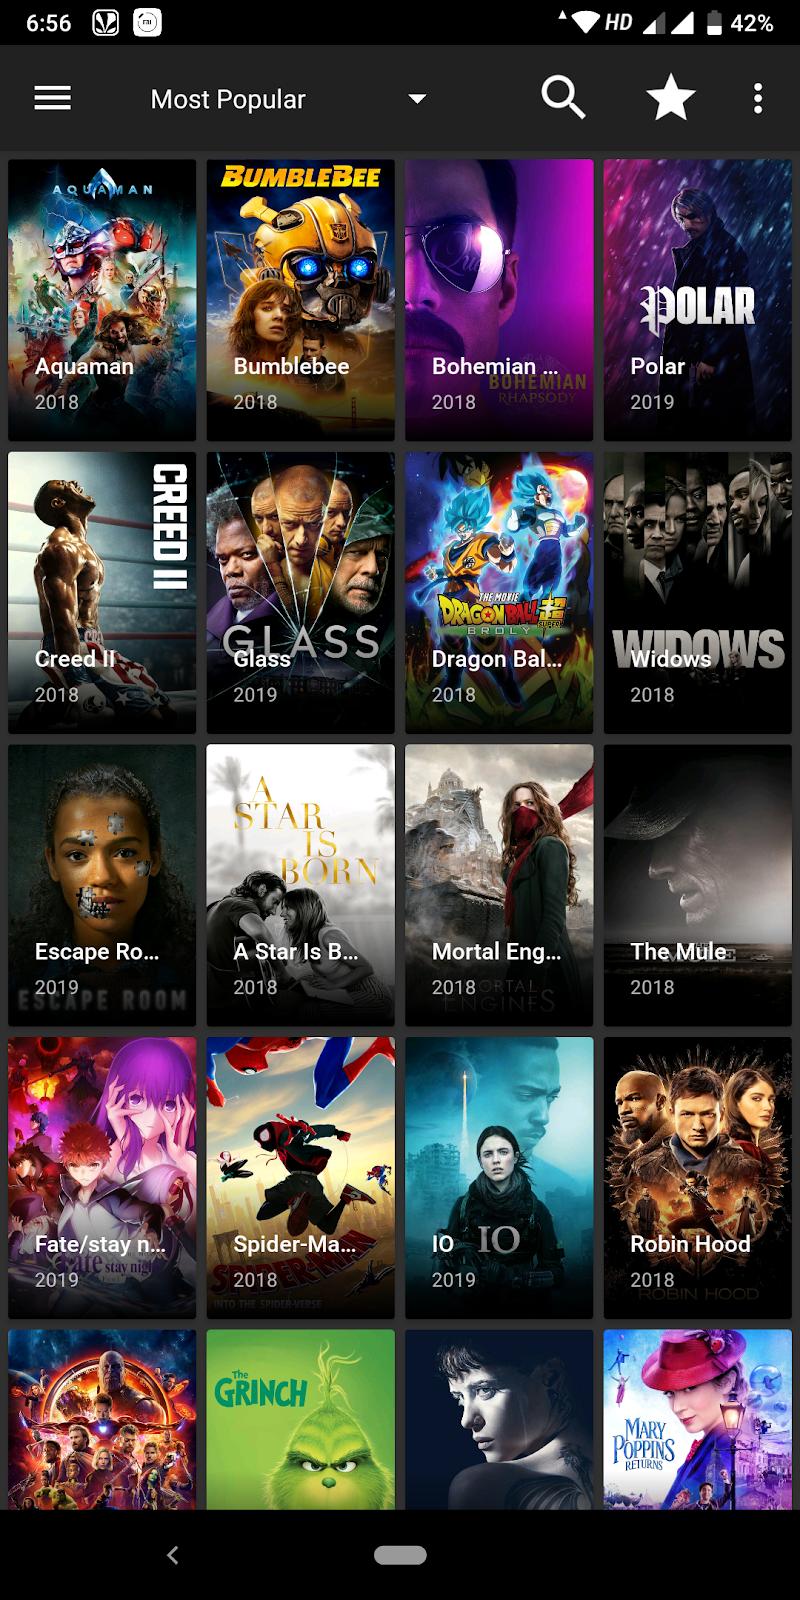 Terrarium TV Free Movie Downloader apk - Google Drive Link - The